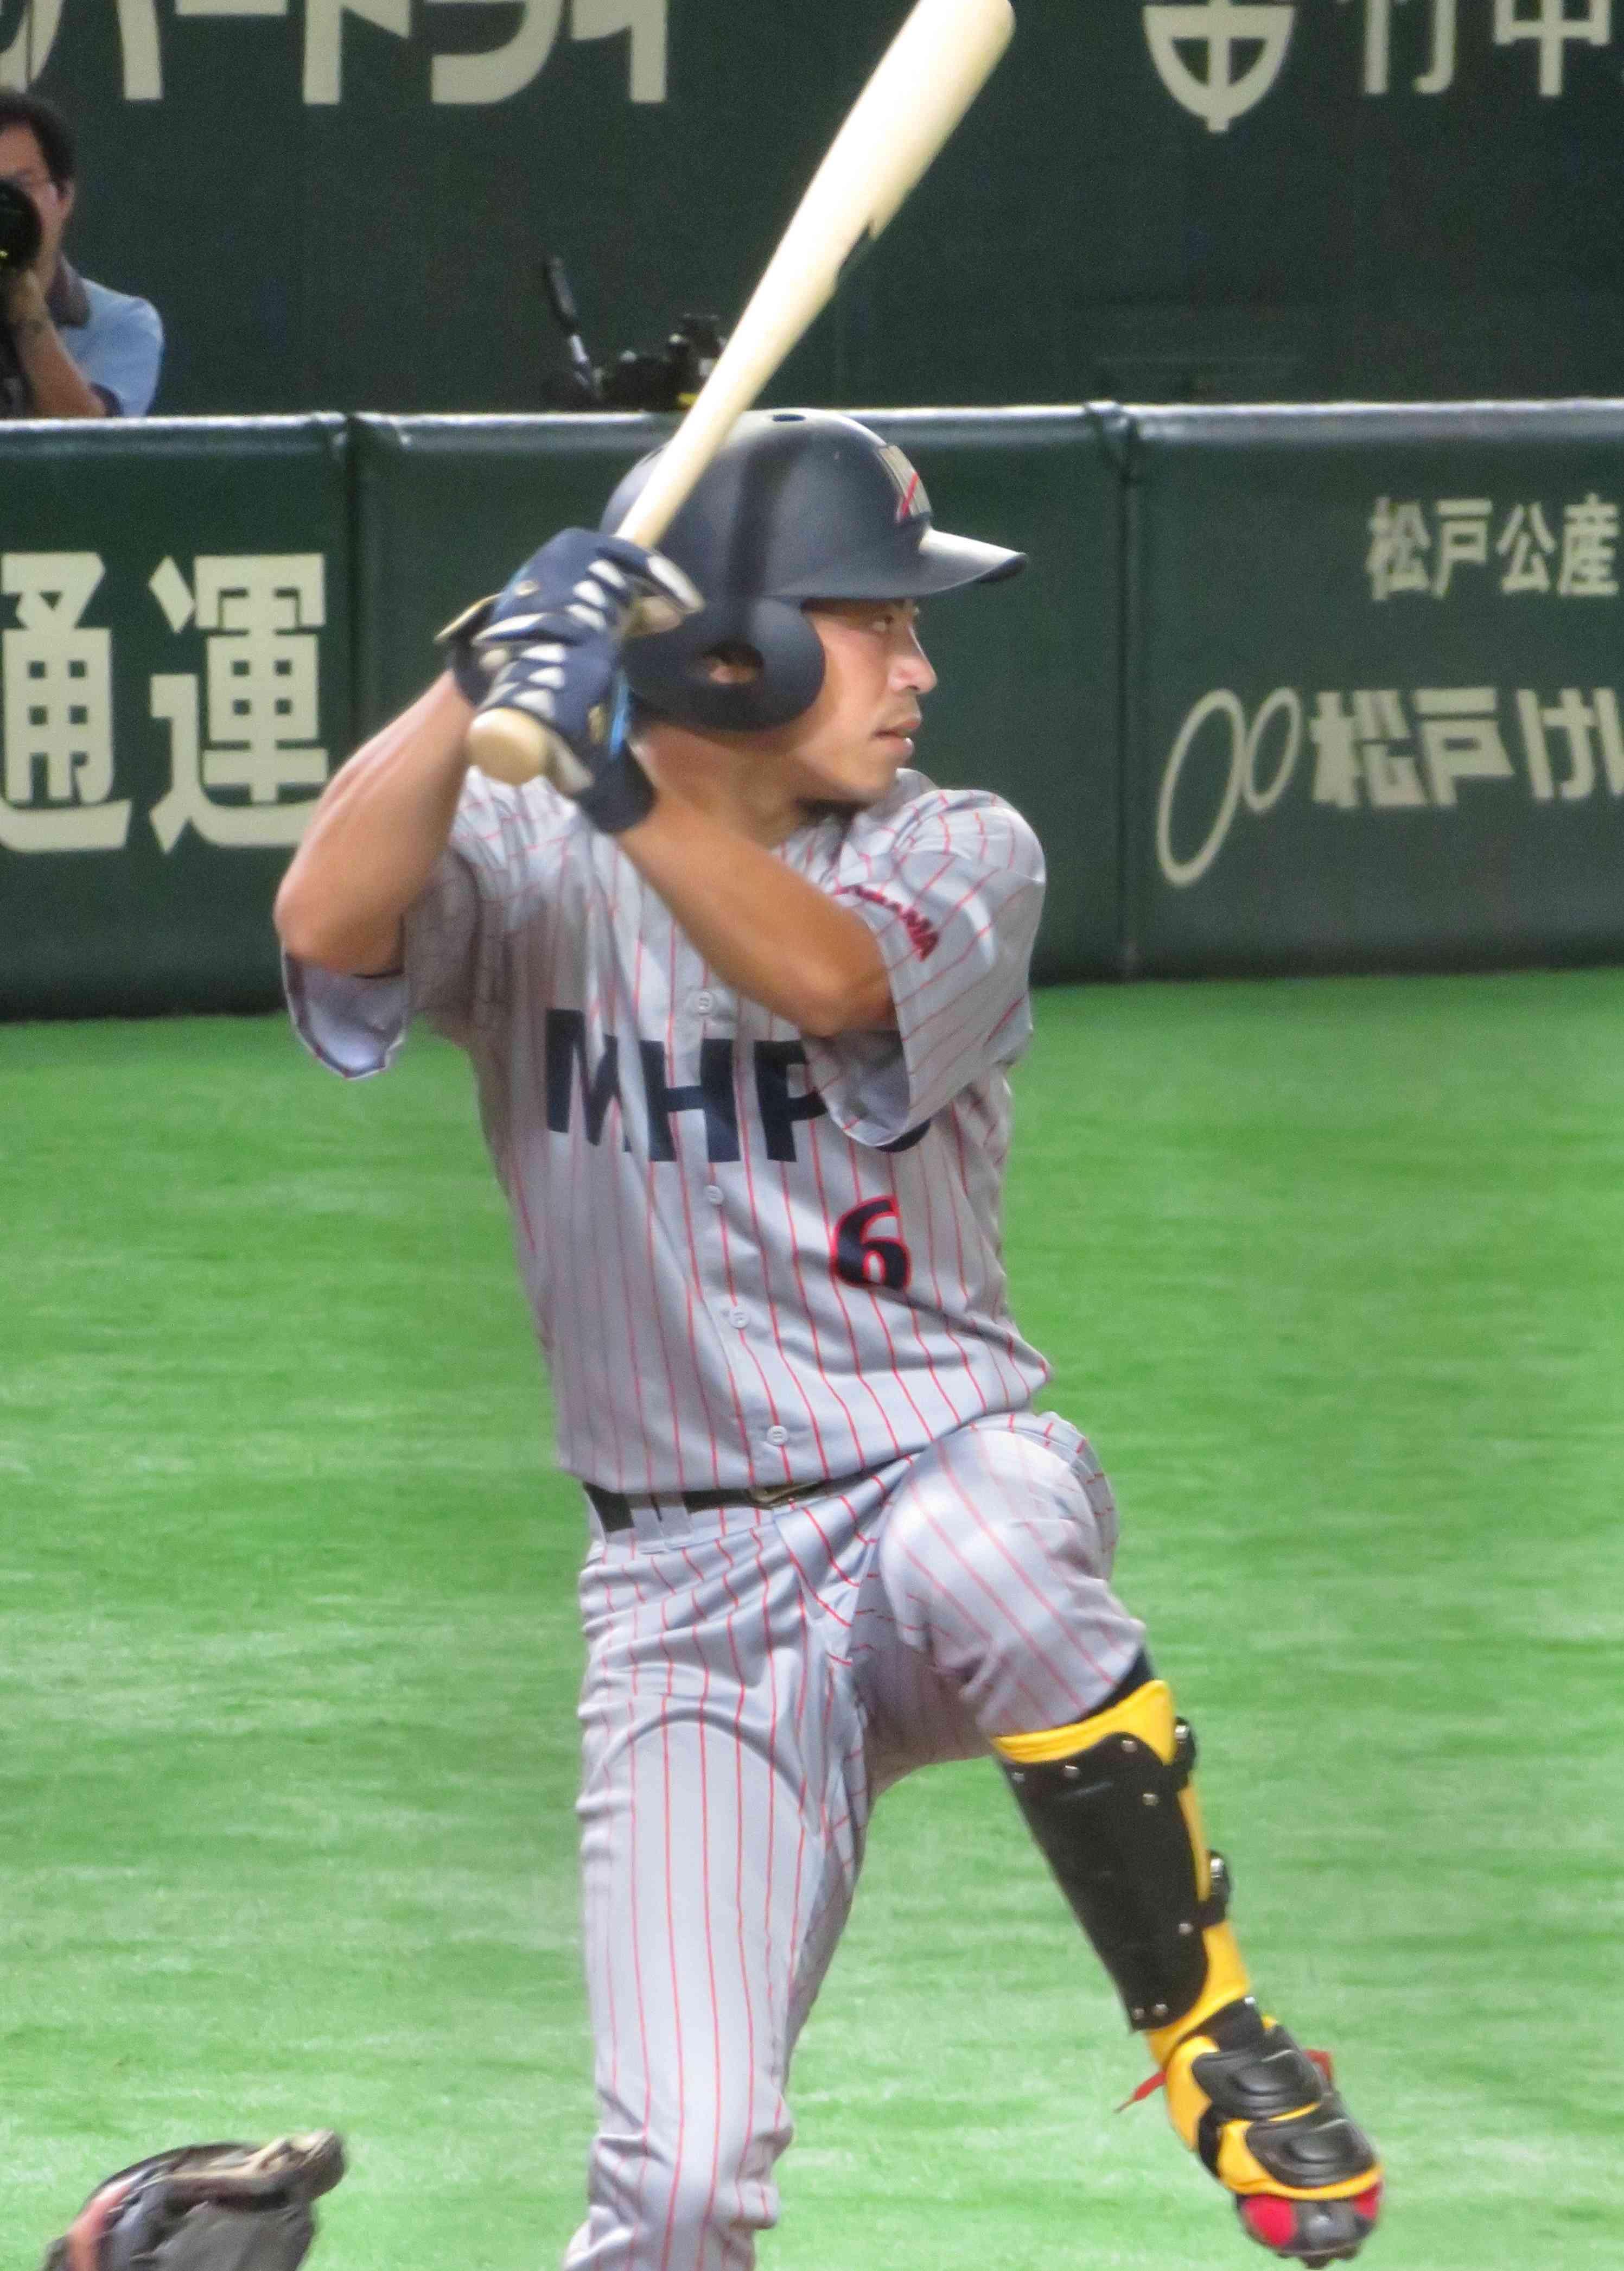 20160715MHPS横浜 中西